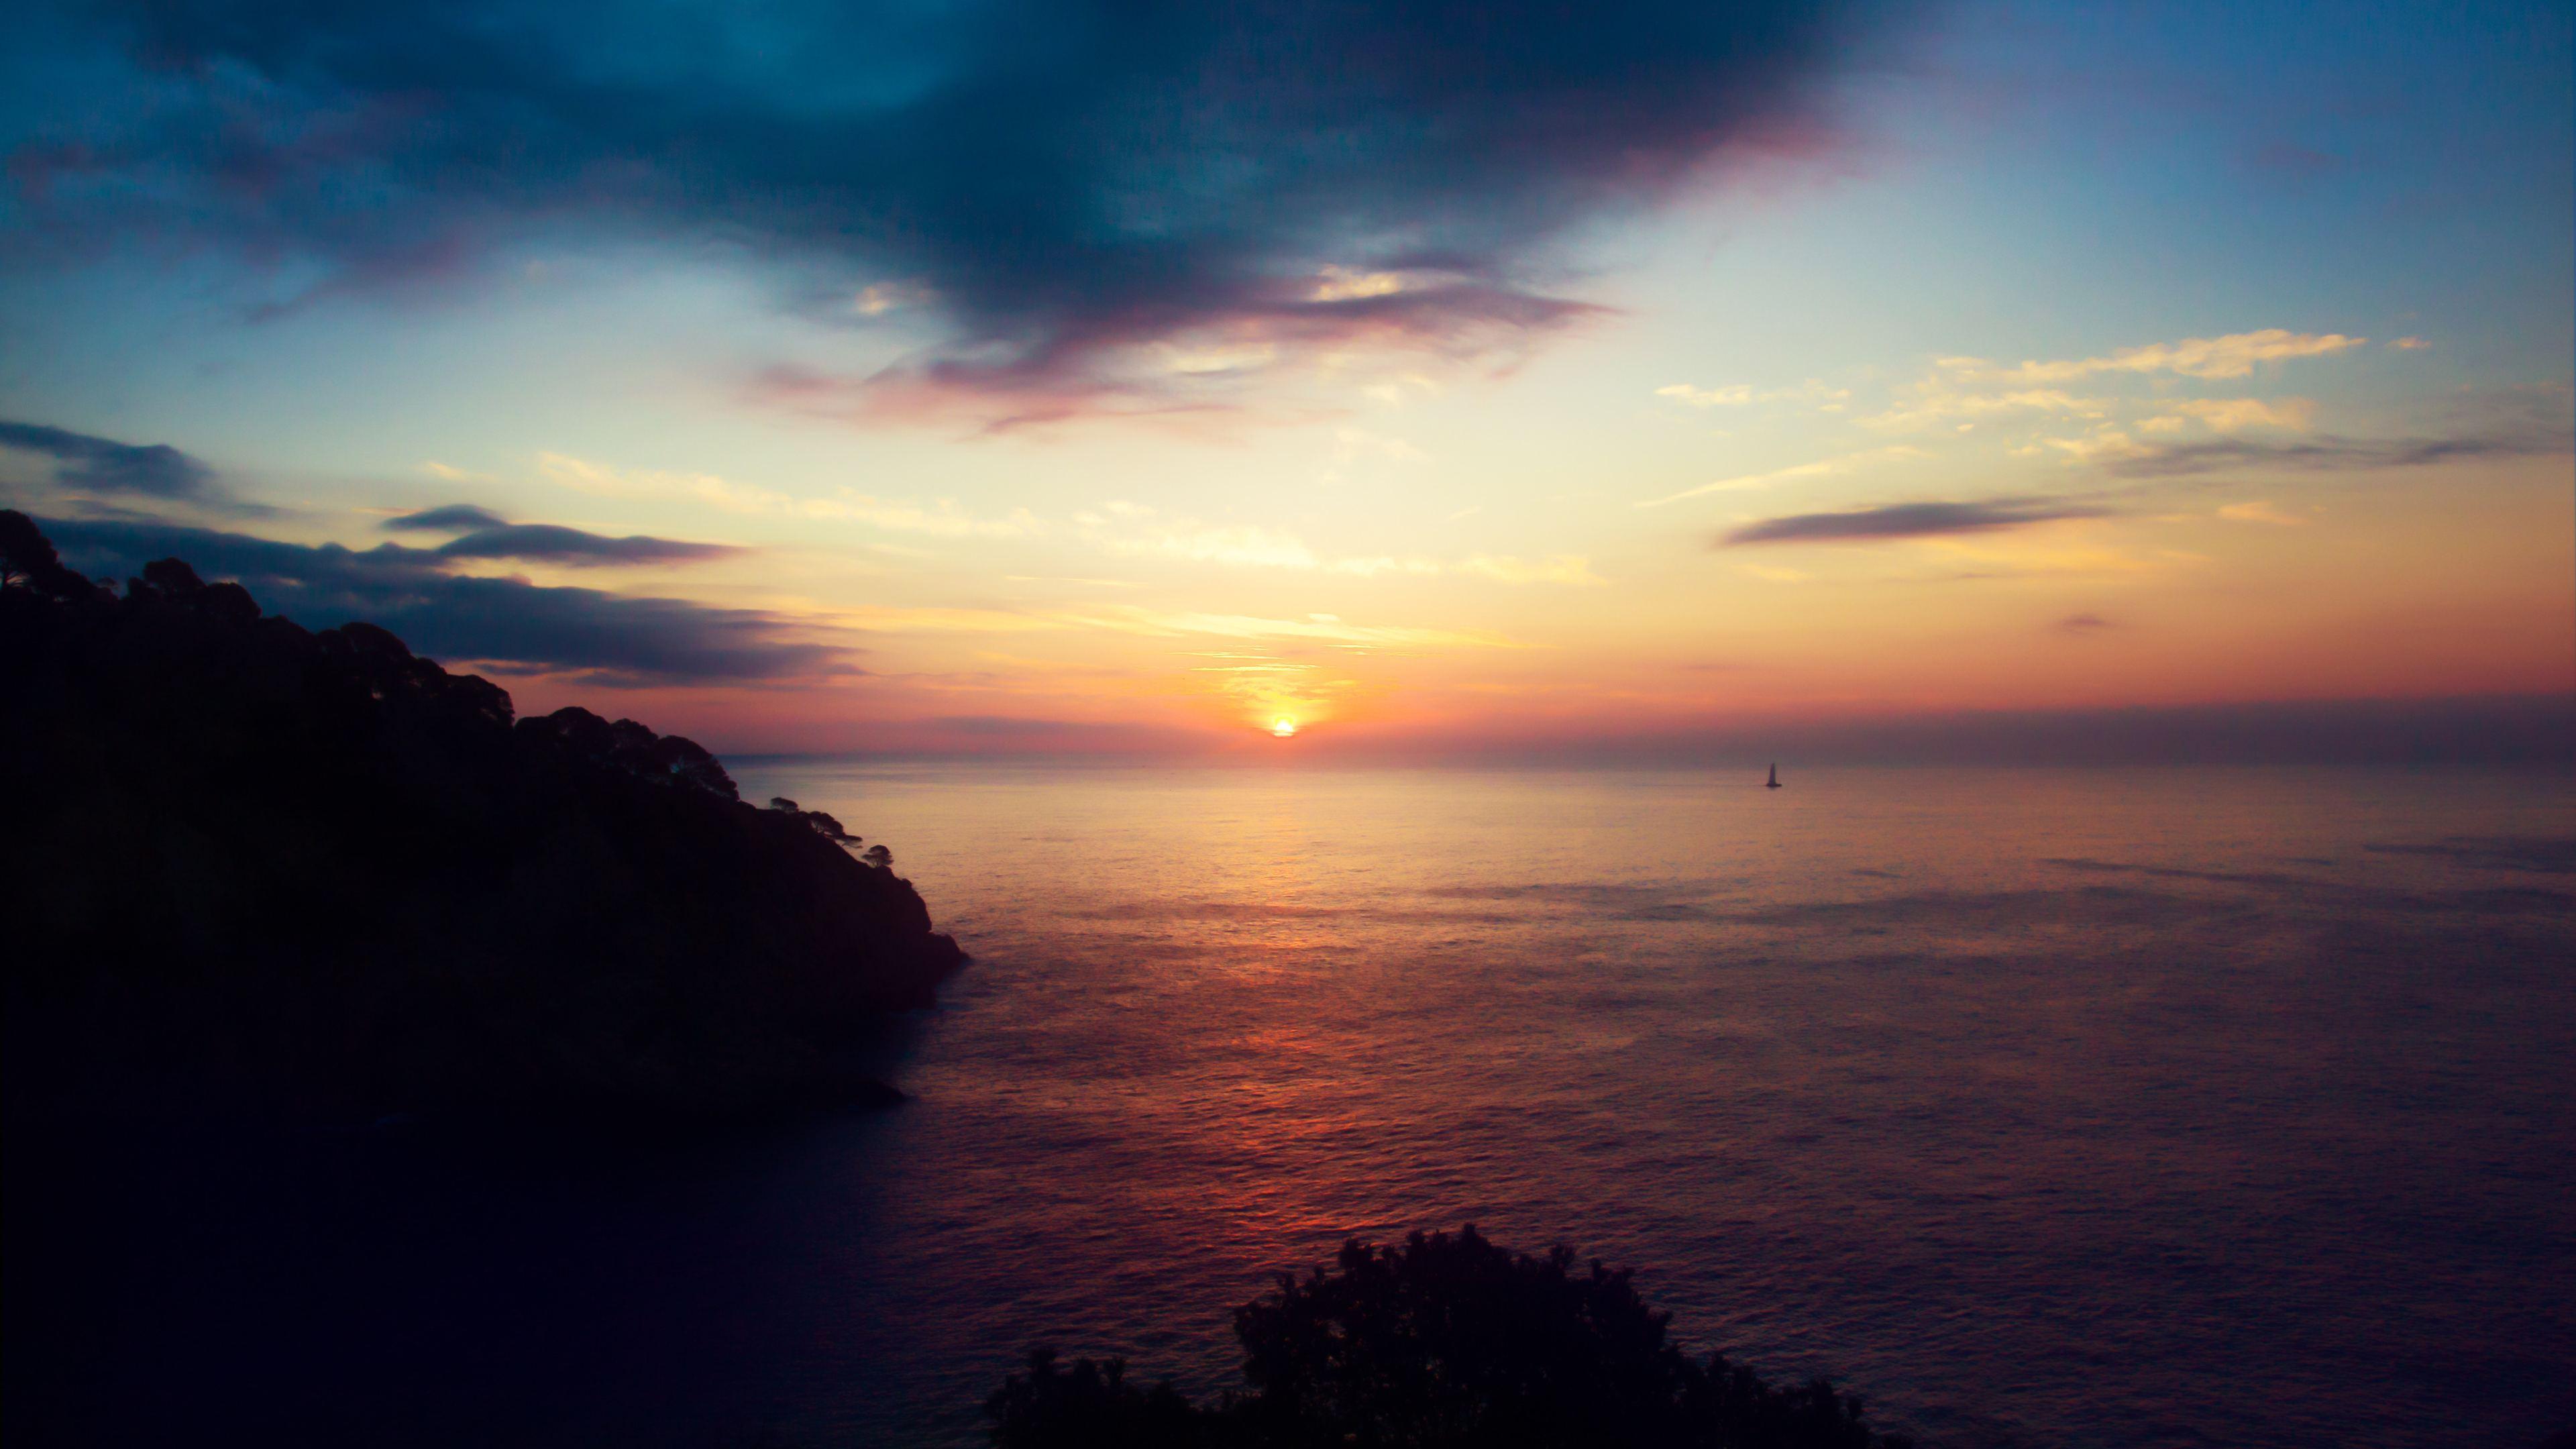 ocean beach sunset 4k 1540140510 - Ocean Beach Sunset 4k - sunset wallpapers, sunrise wallpapers, ocean wallpapers, nature wallpapers, hd-wallpapers, dusk wallpapers, dawn wallpapers, beach wallpapers, 5k wallpapers, 4k-wallpapers